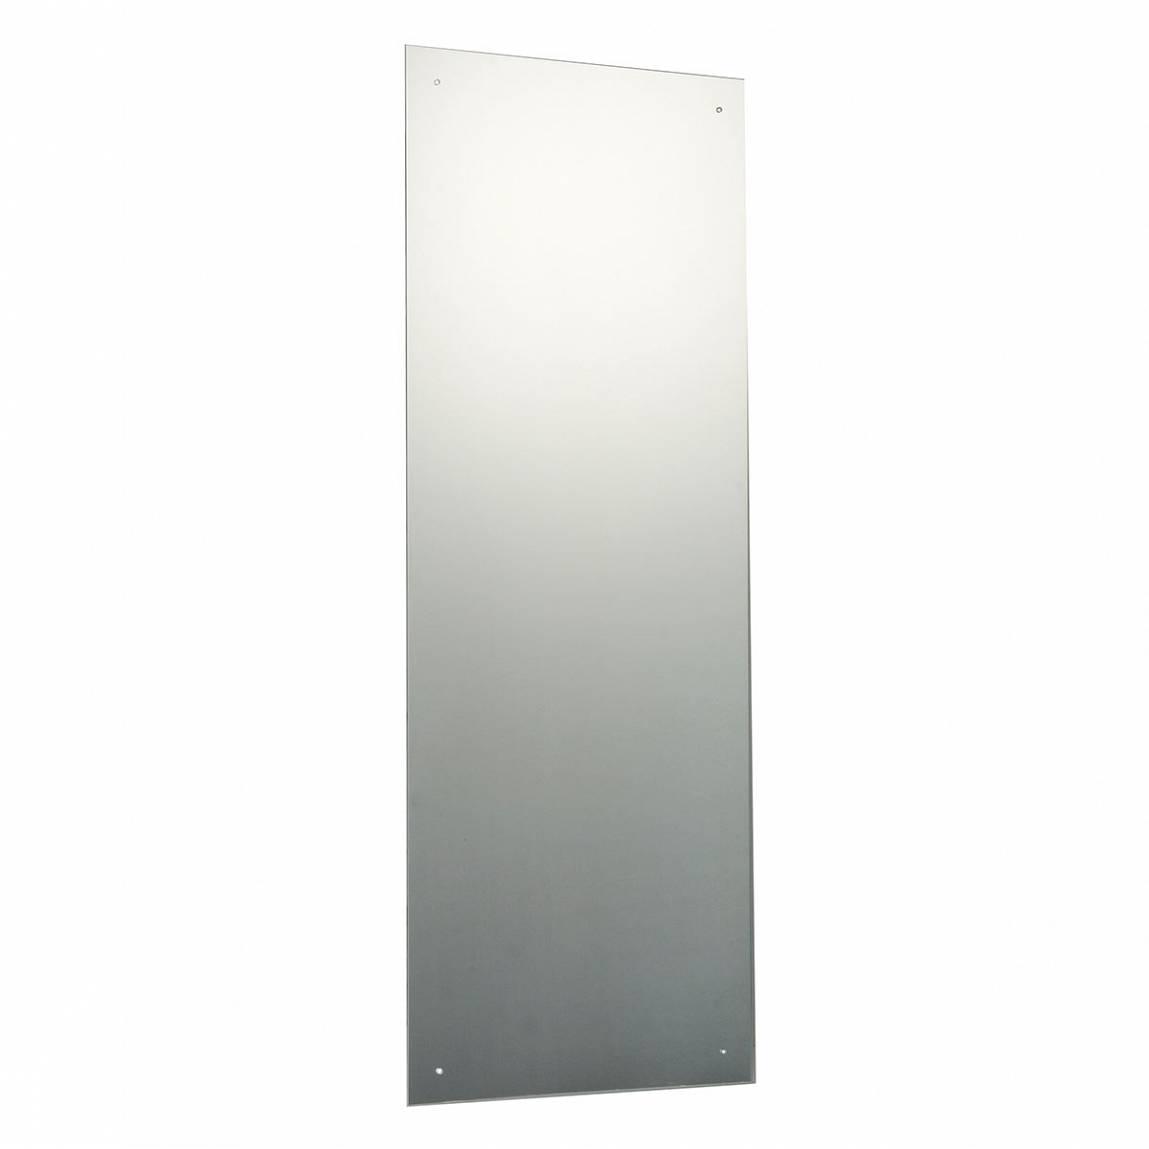 Image of Rectangular Drilled Mirror 120x45cm